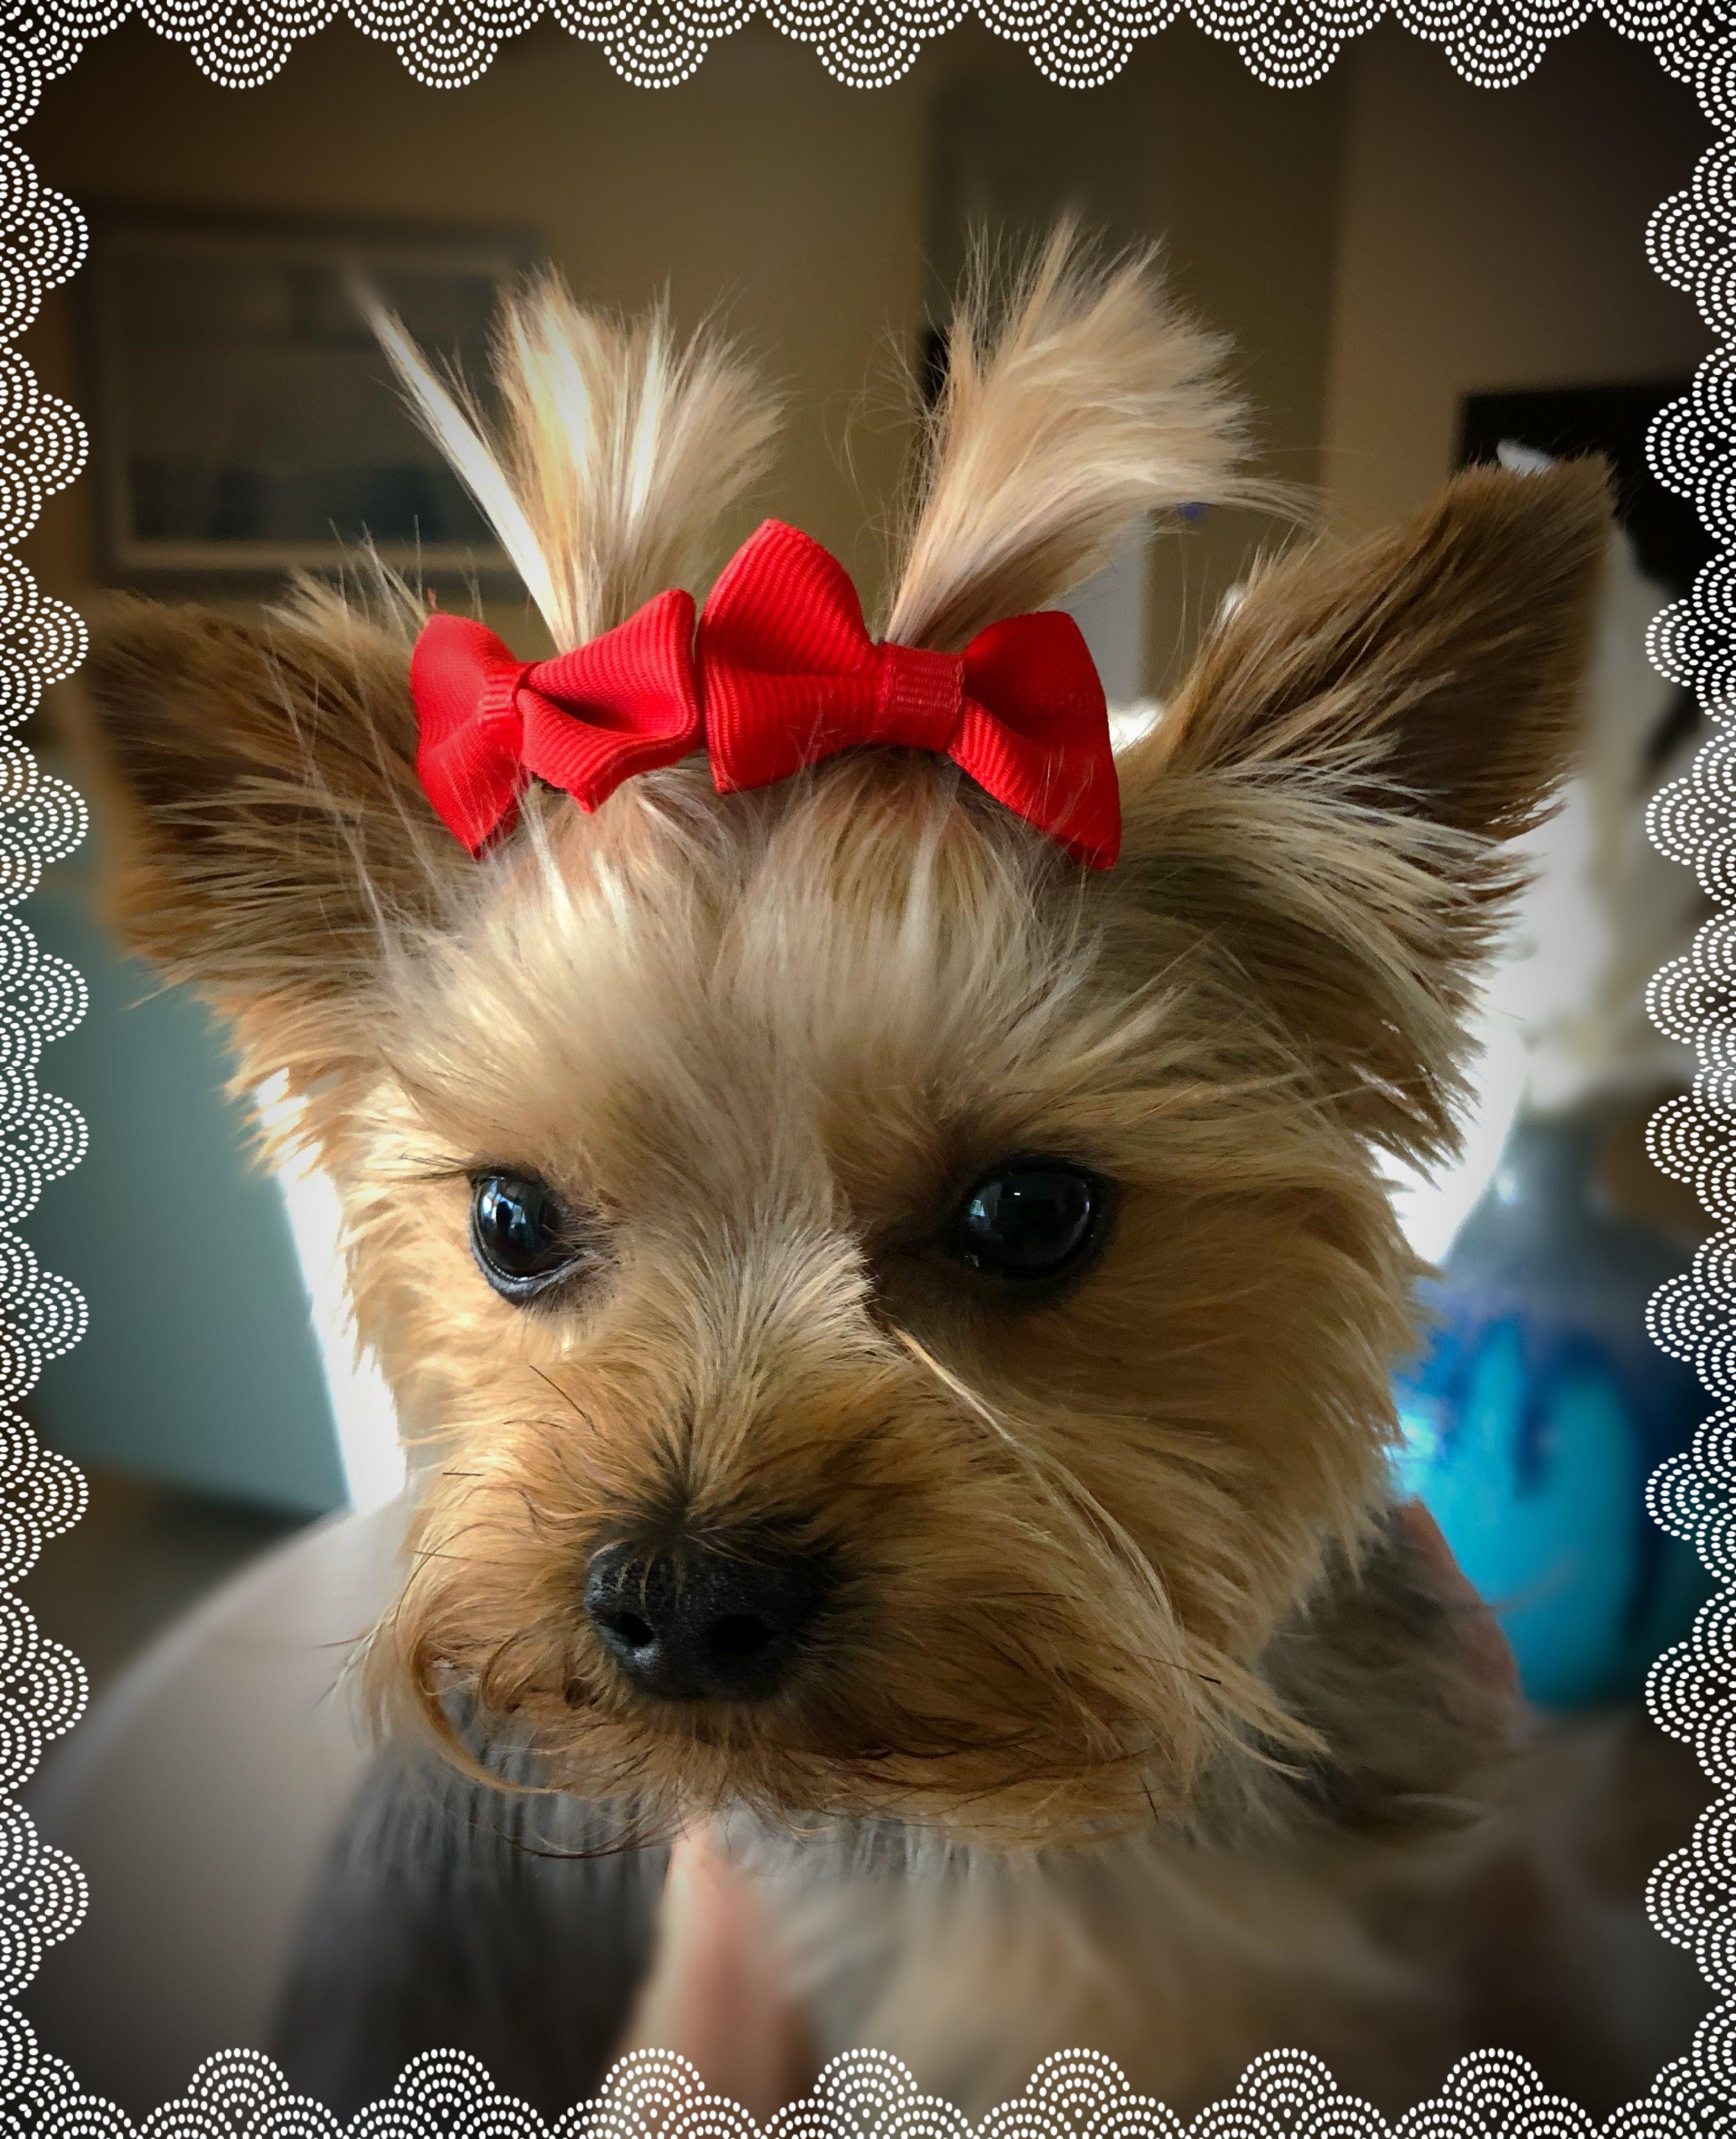 Pin by jennifer dibaririggs on animals pinterest dogs puppies